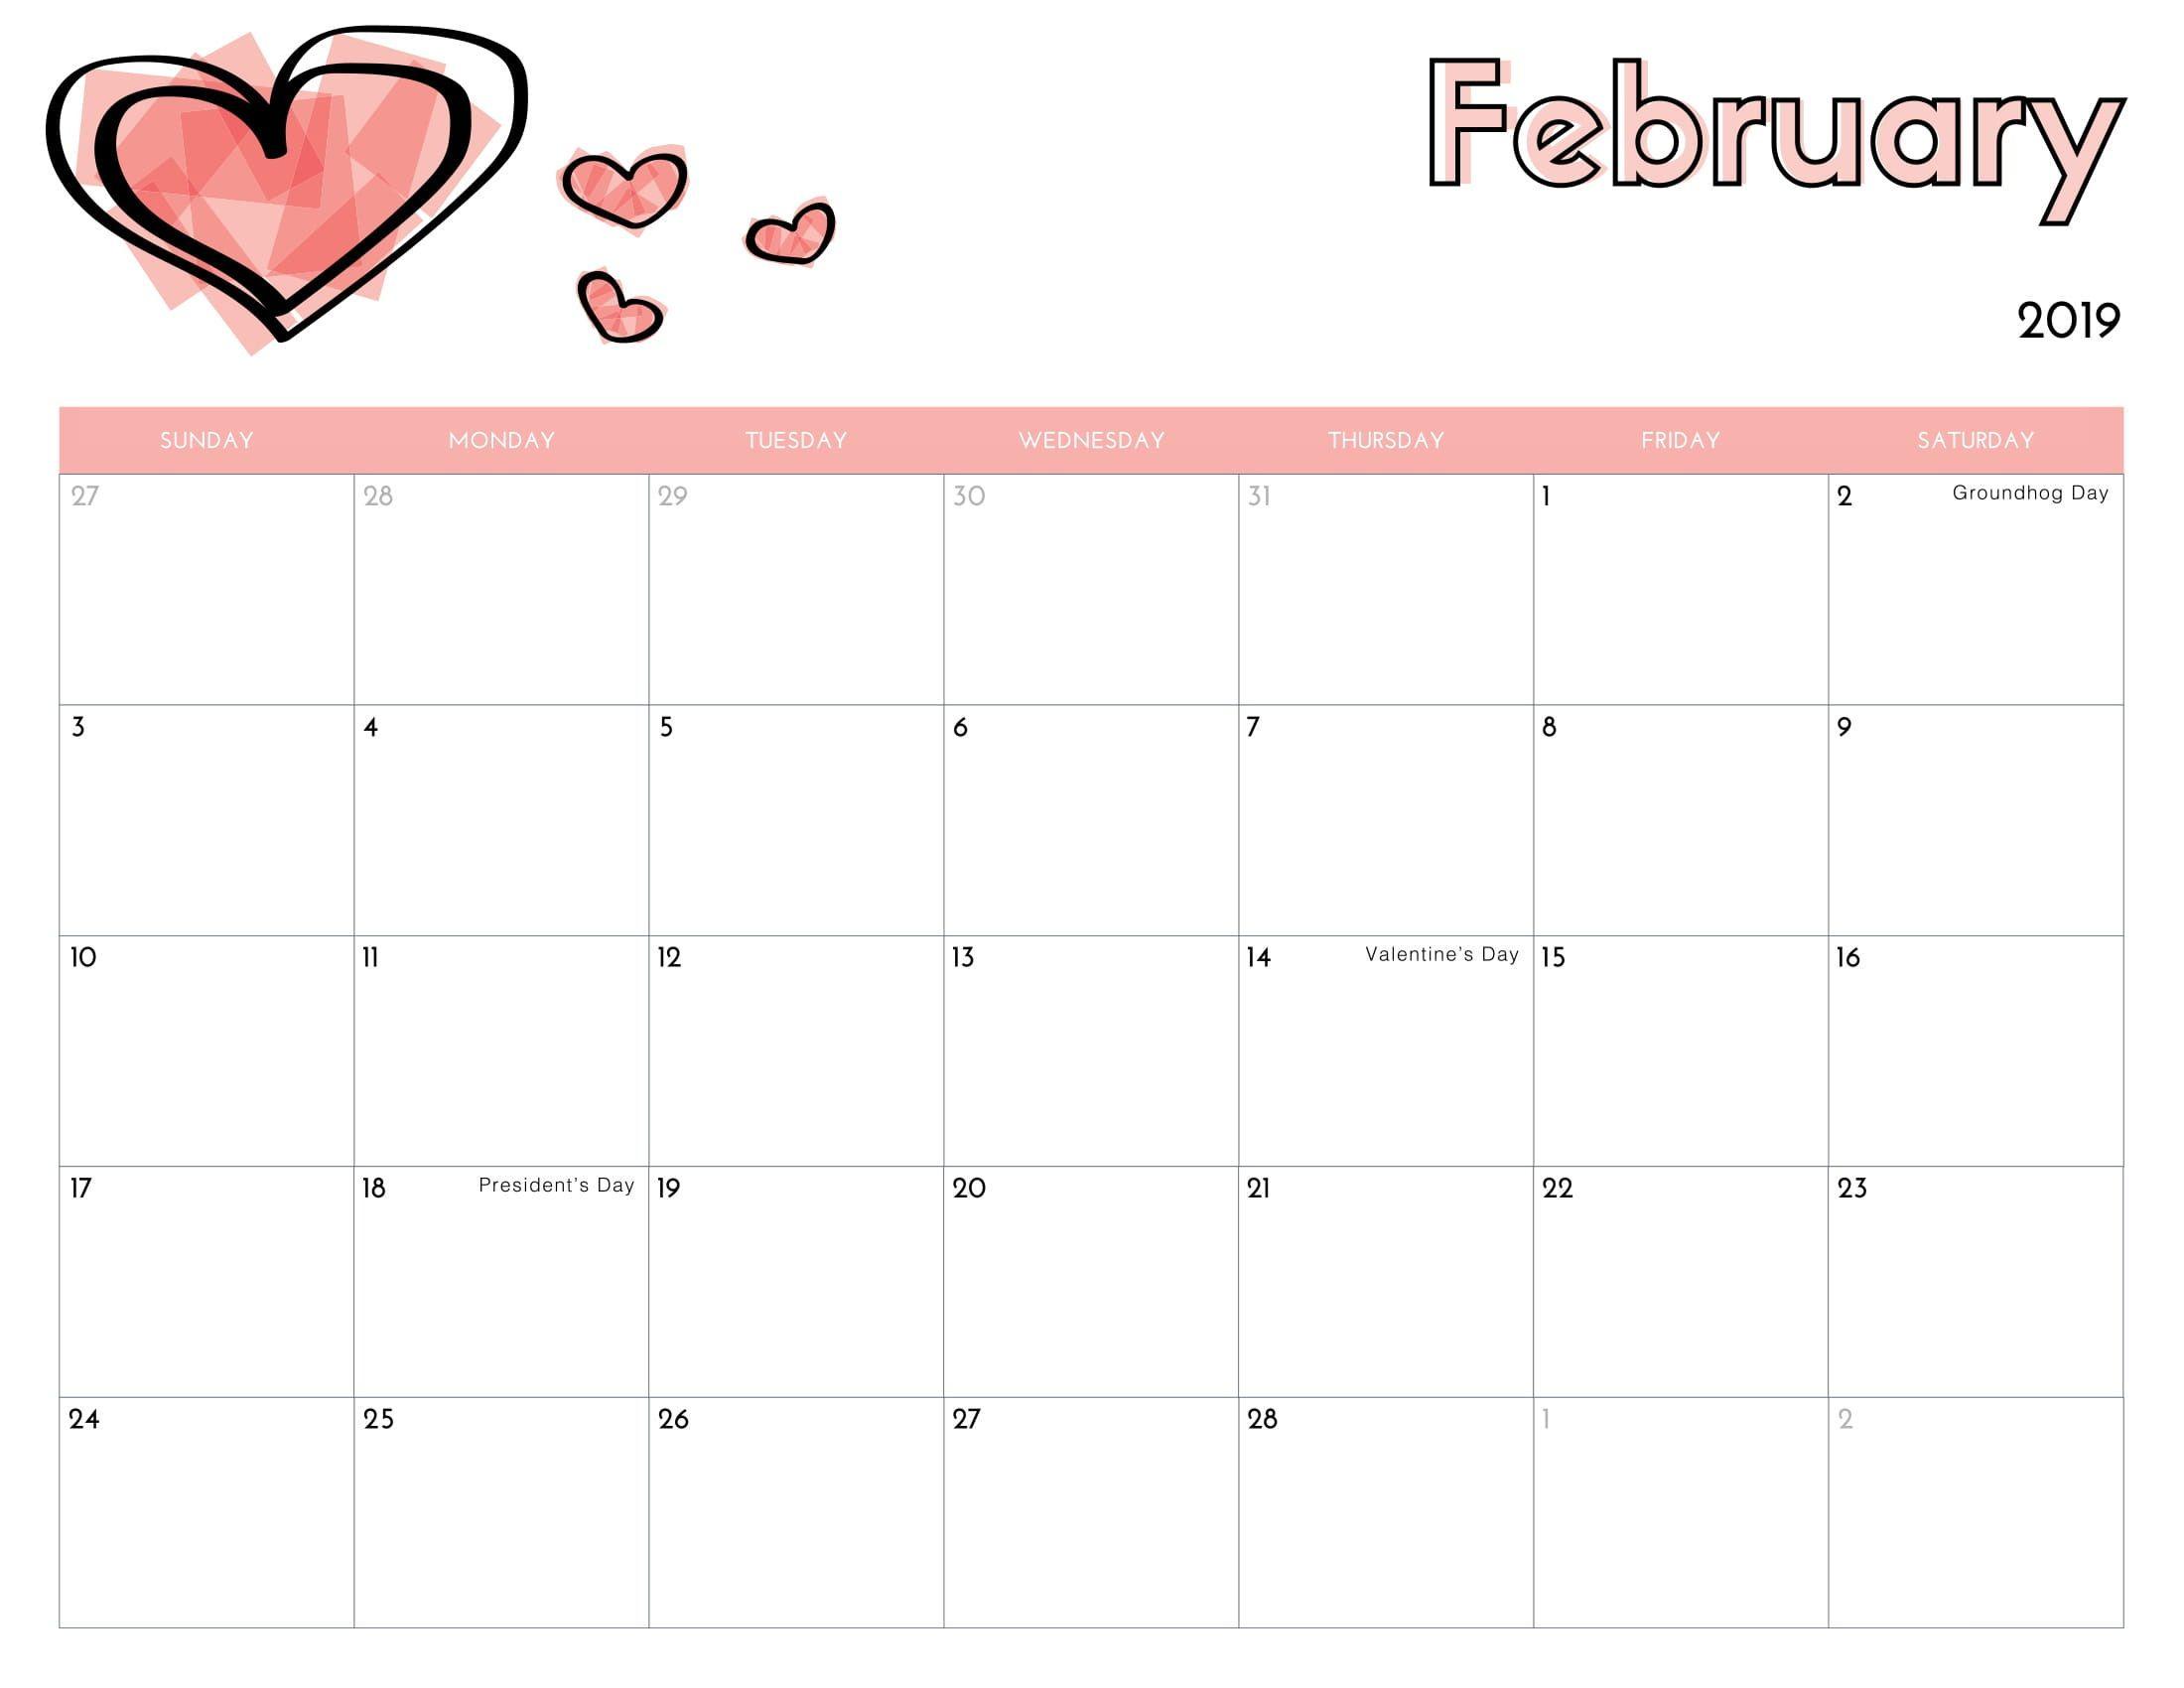 February Heart 2019 Calendar Calendar February 2019 With Holidays. #february #february2019